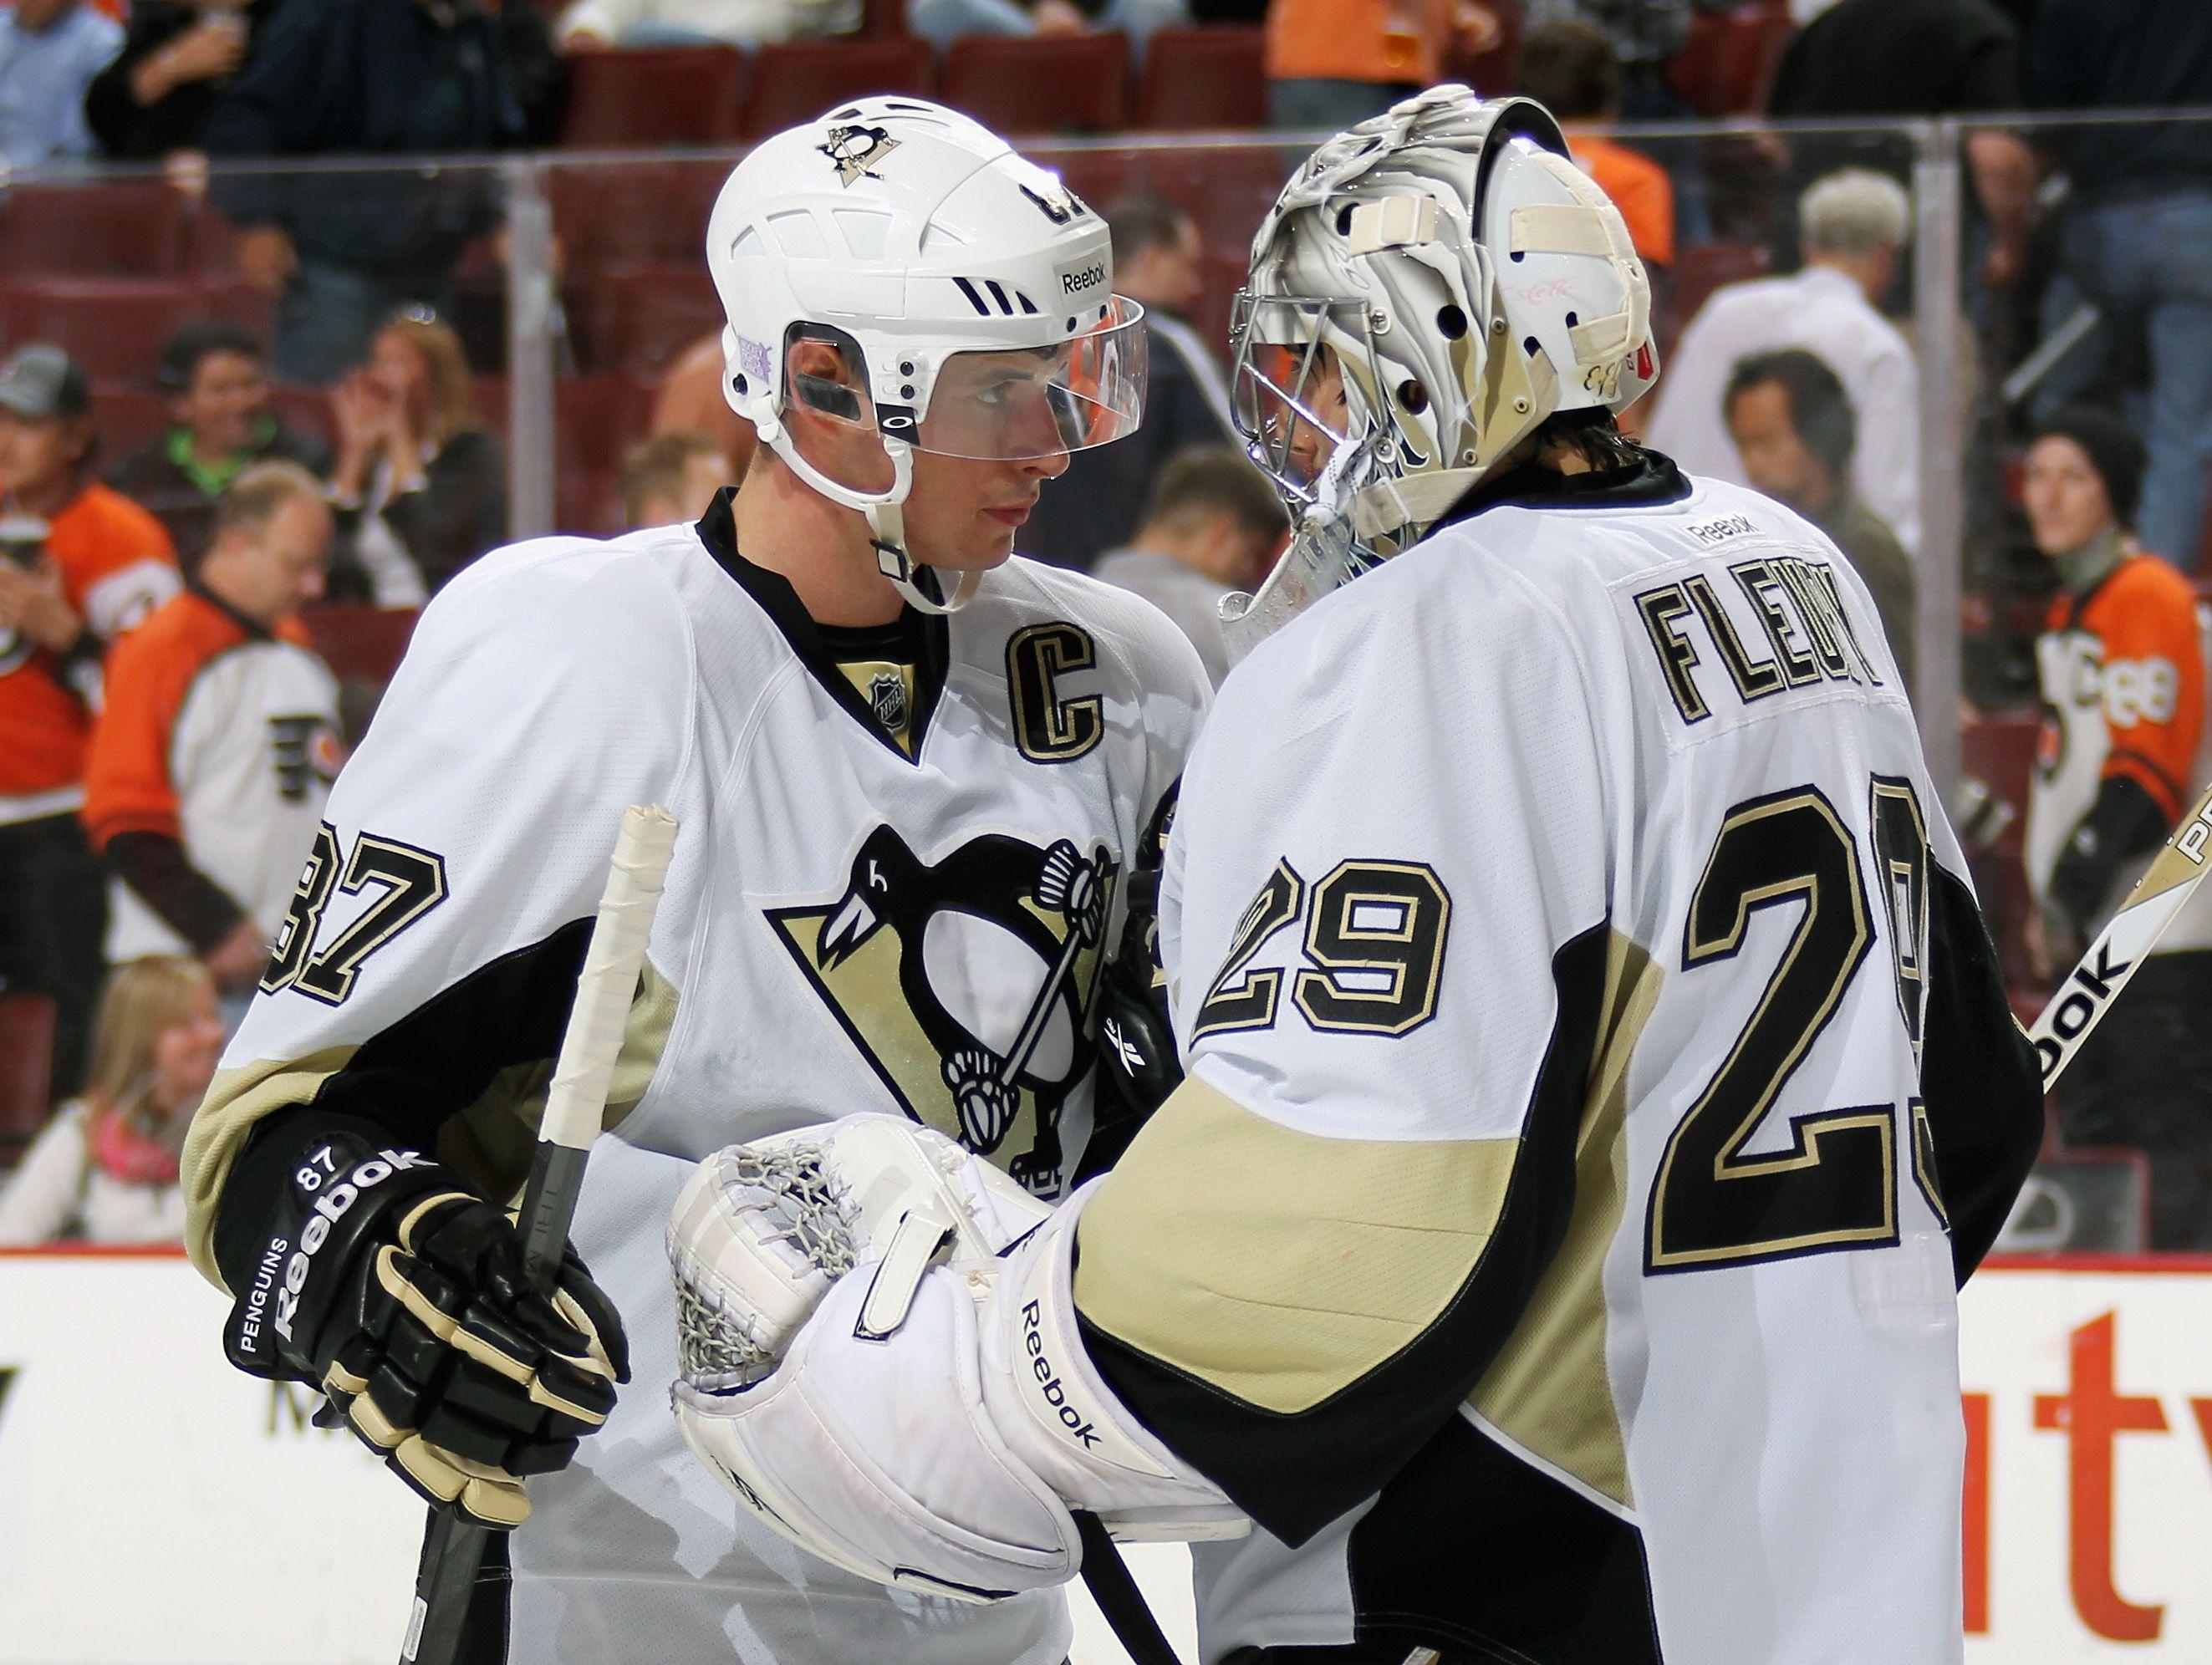 Sidney Crosby Marc Andre Fleury Penguins Pittsburgh Pittsburgh Penguins Penguins Hockey Penguins